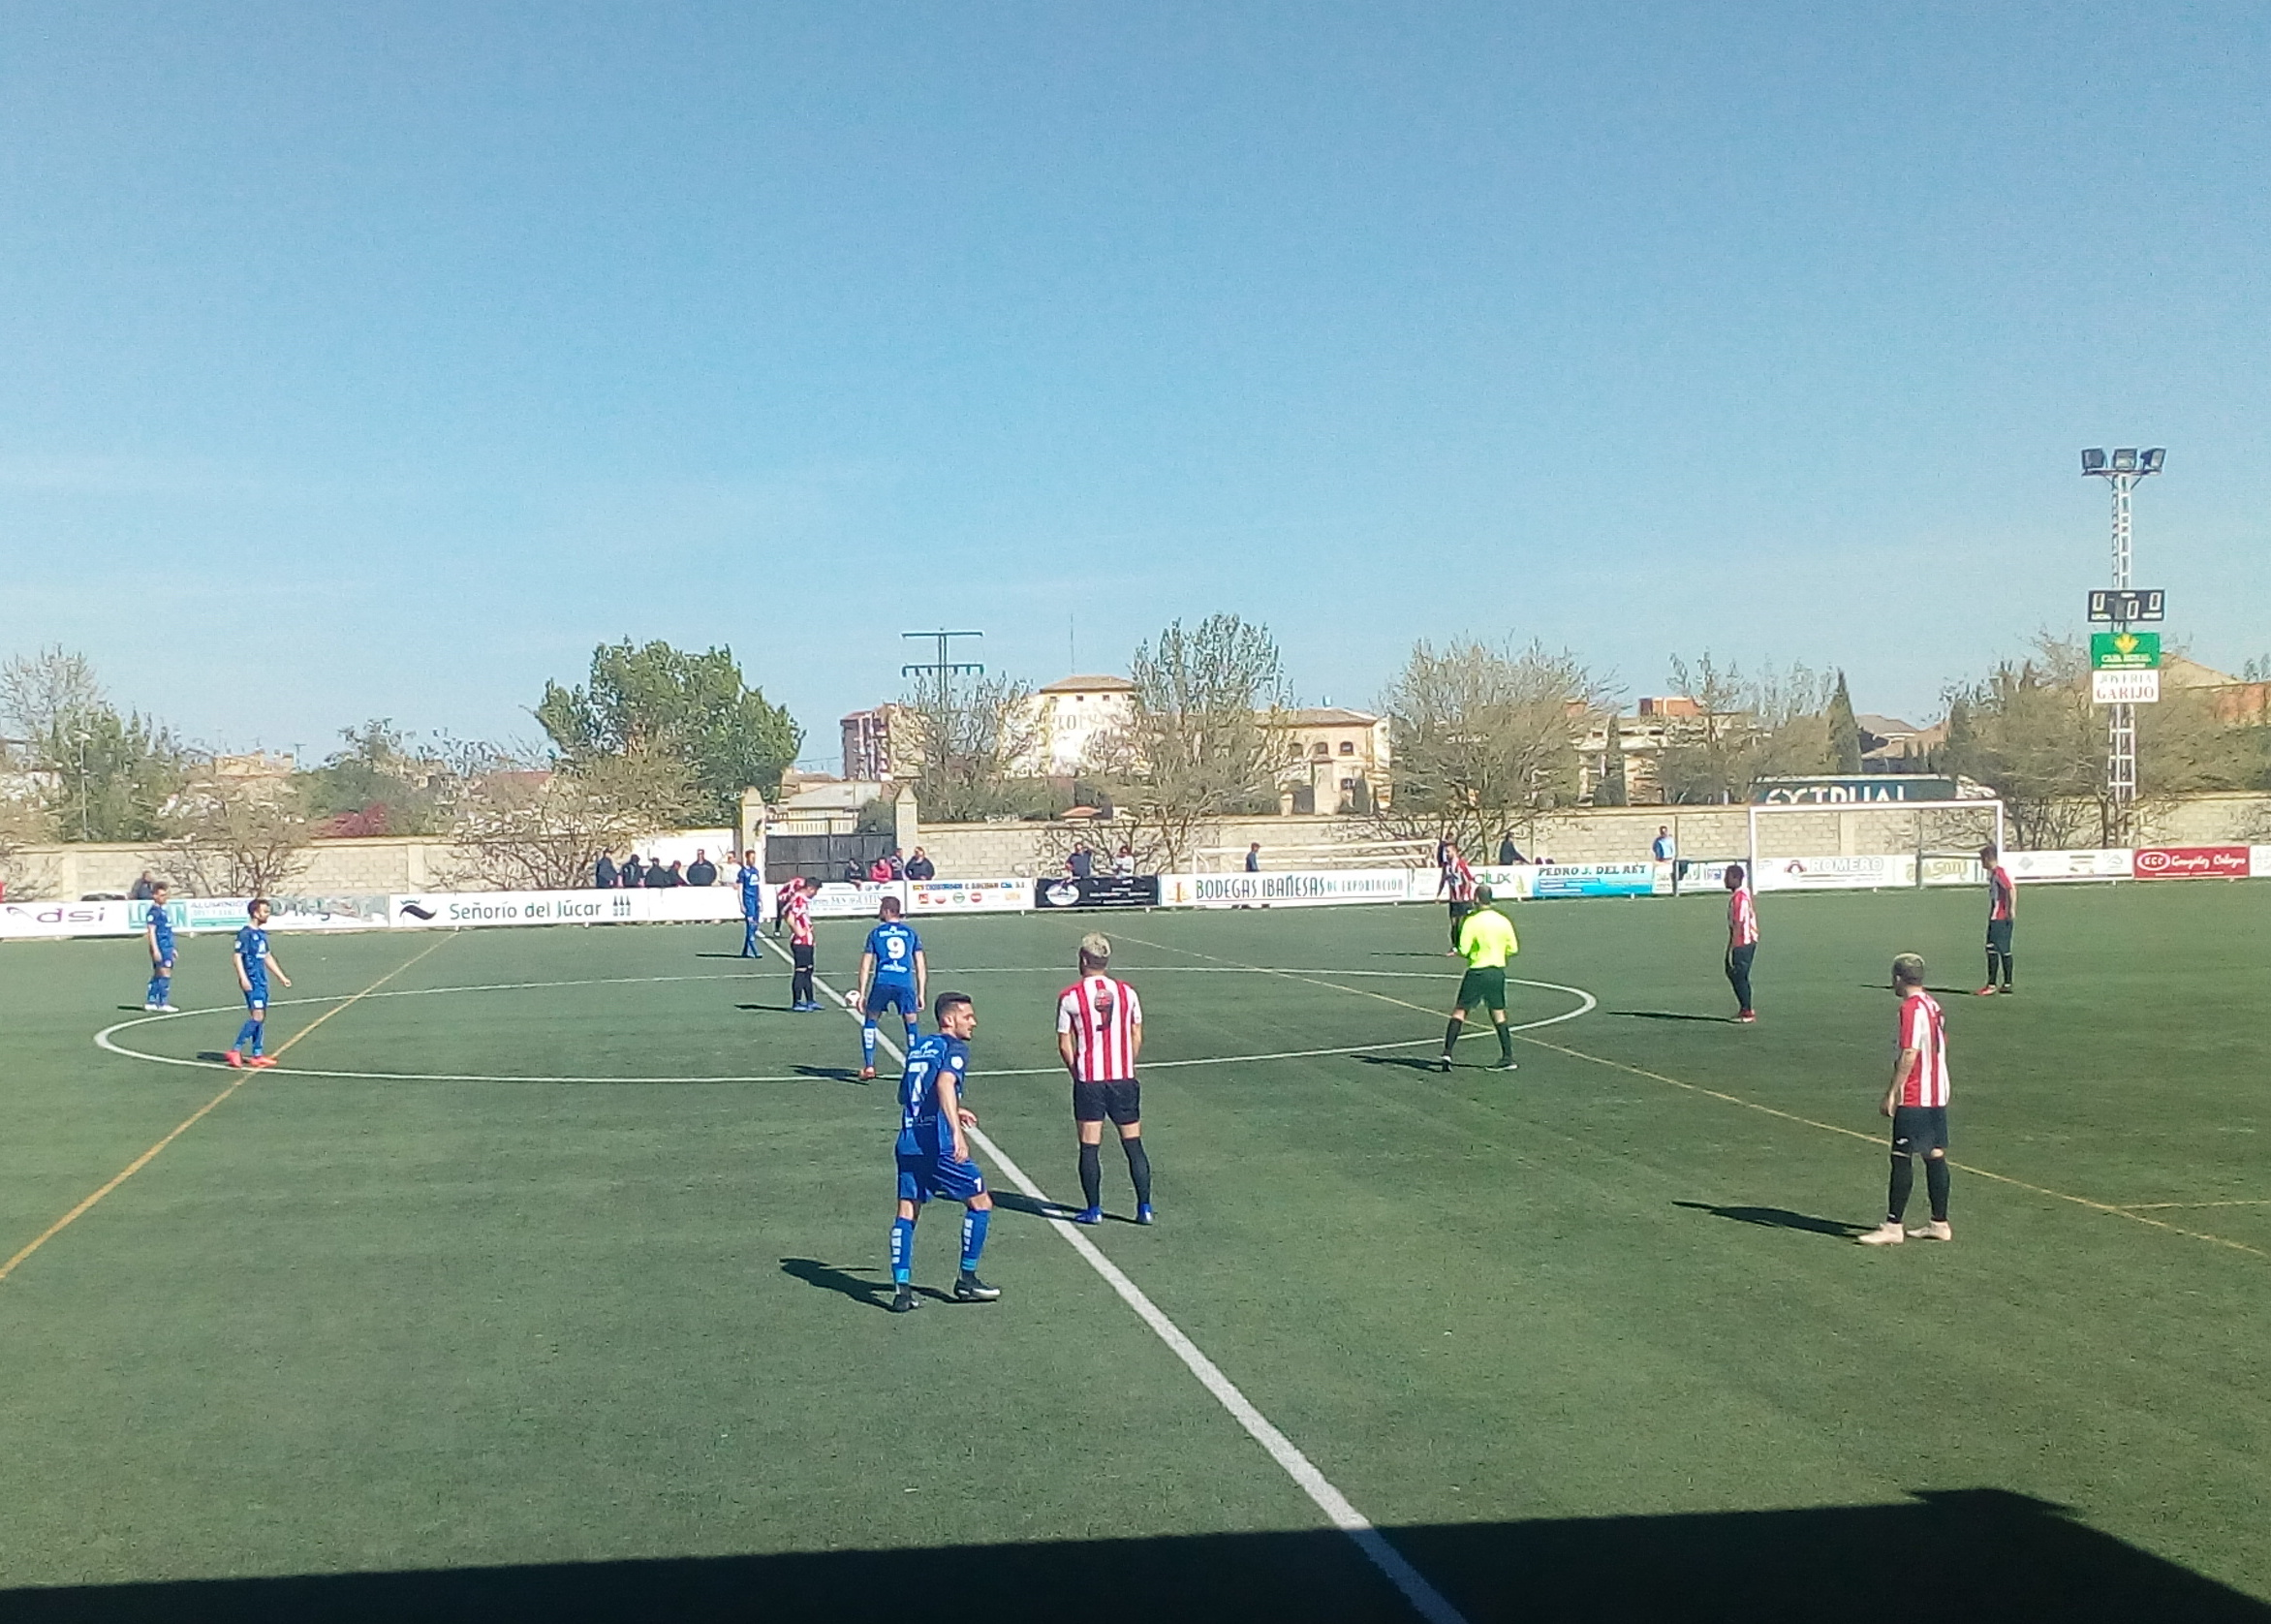 Atlético Ibañés - CP Villarrobledo